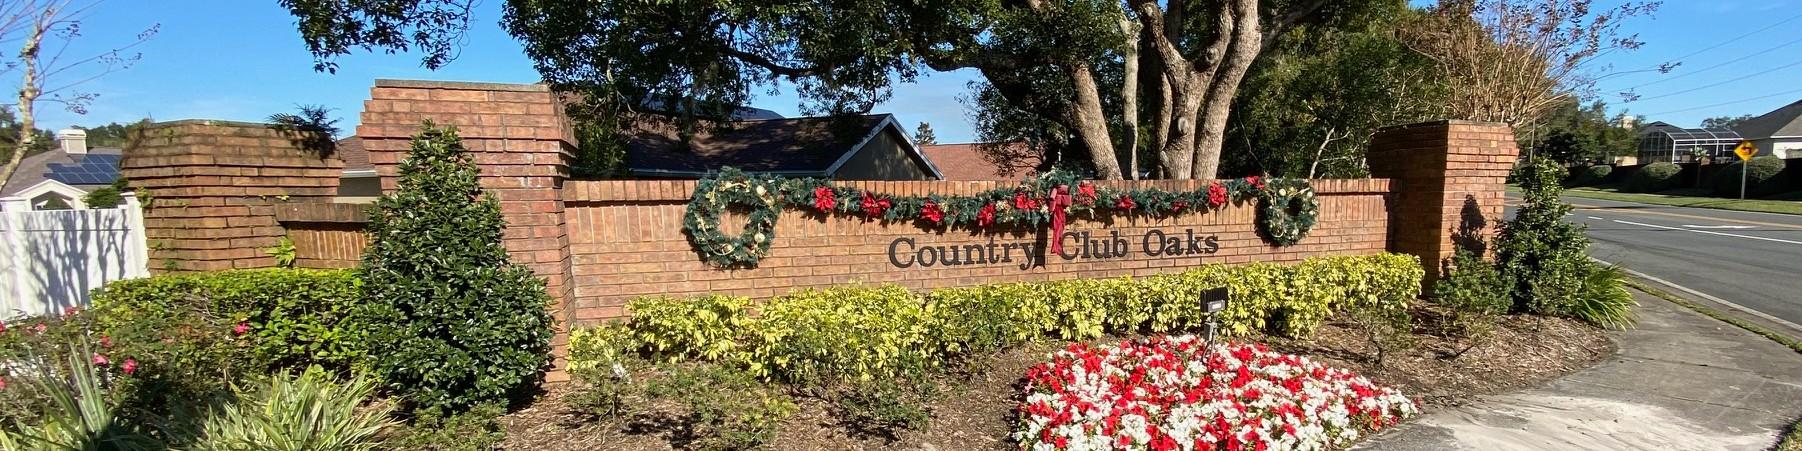 Country Club Oaks